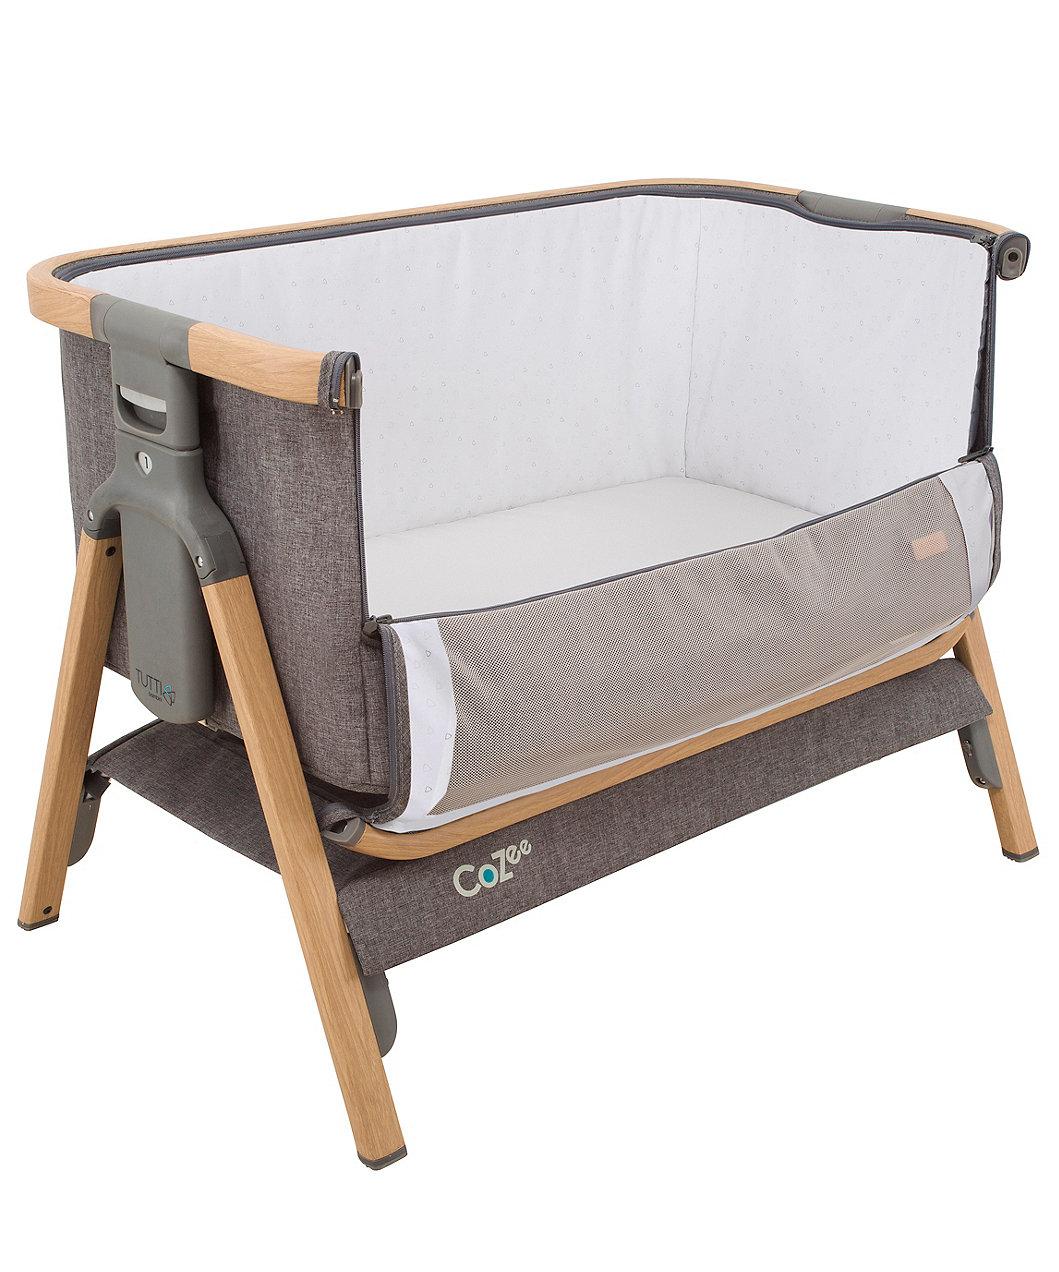 Tutti Bambini Cozee Bedside Crib Charcoal